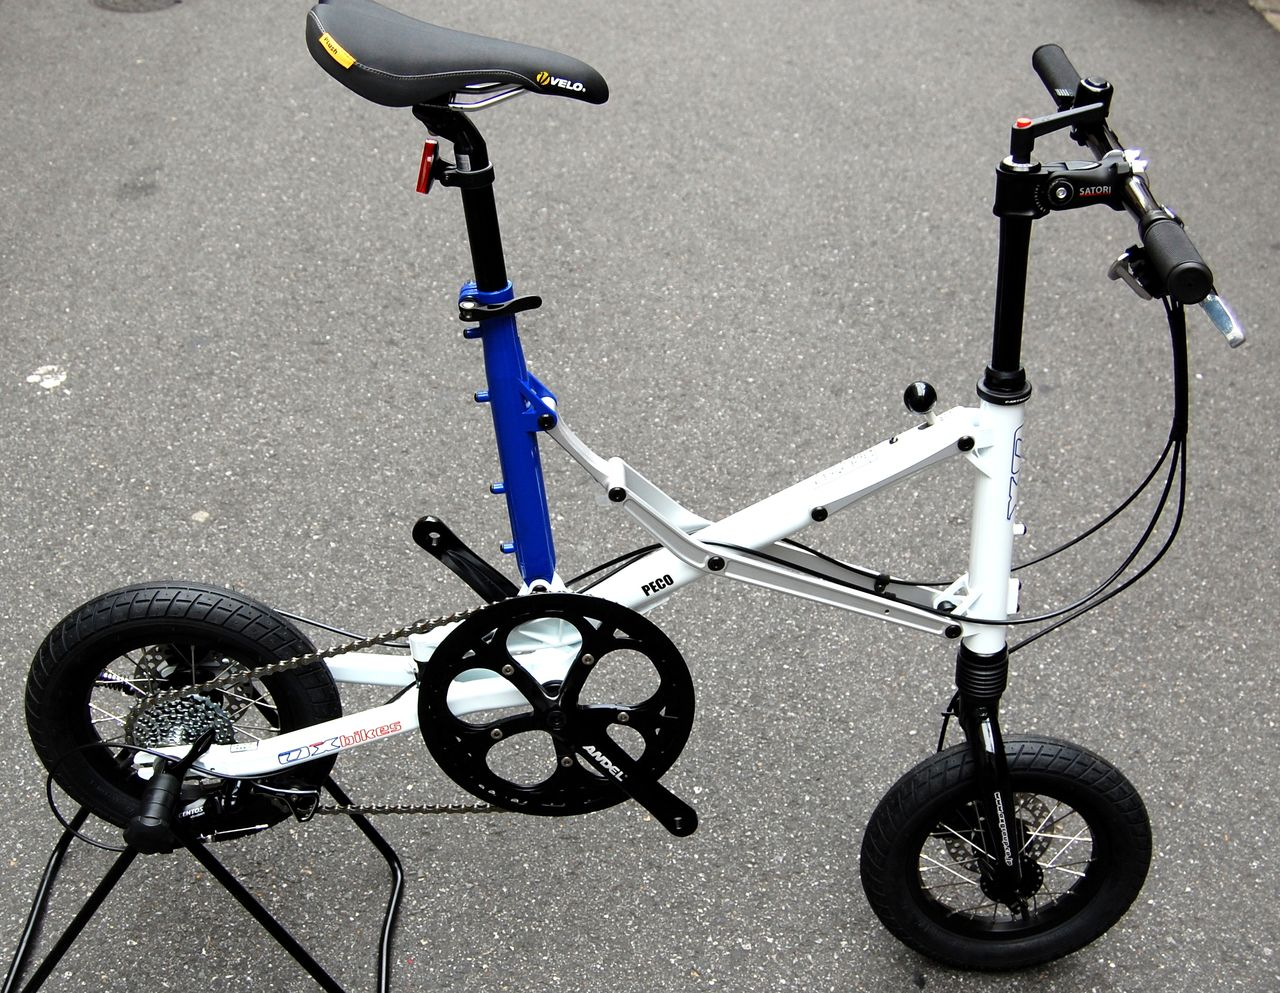 自転車の 自転車 内装8段化 : OX PECO-8S (外装8段) 99.800円